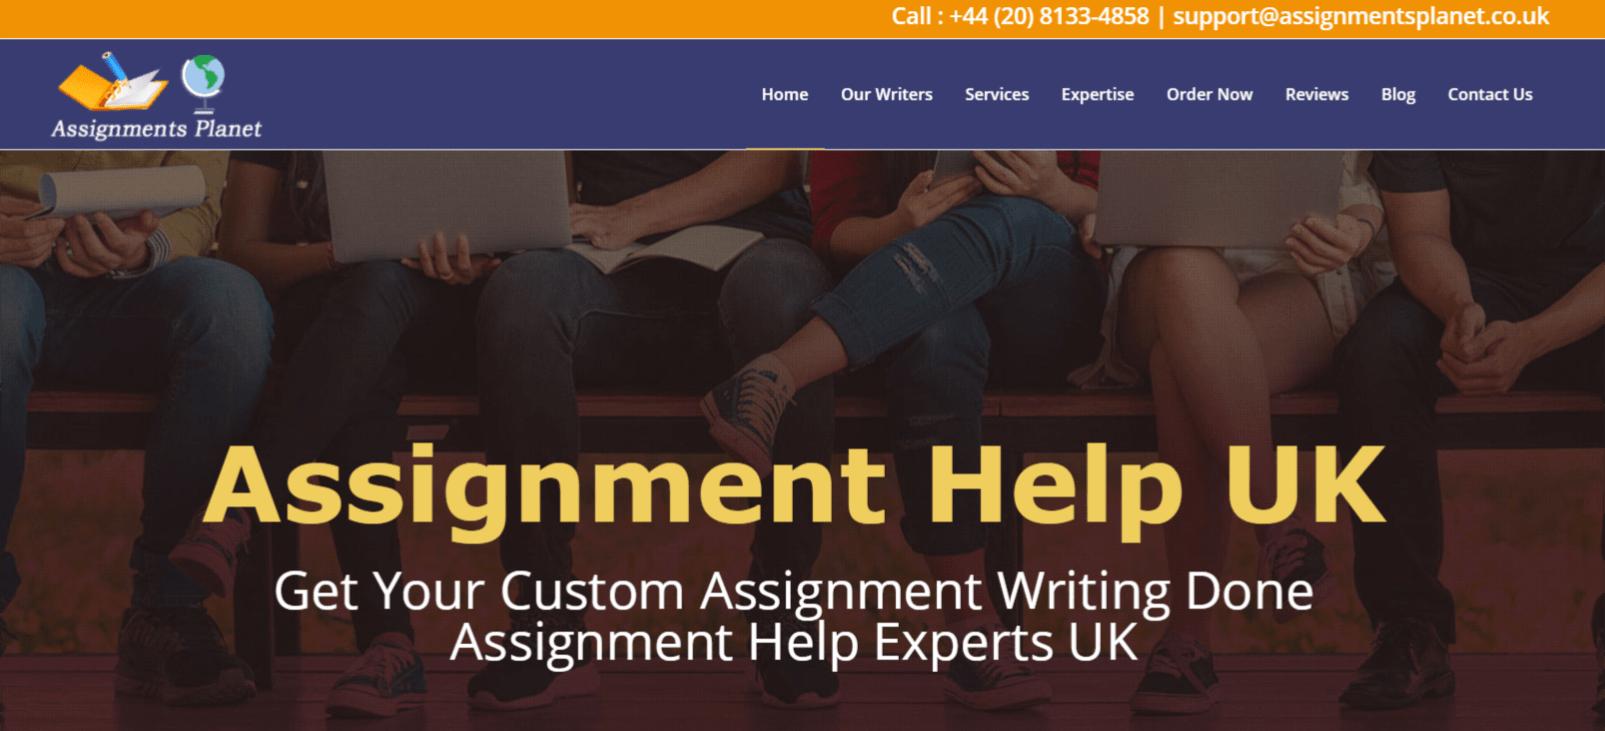 Assignmentsplanet.co.uk